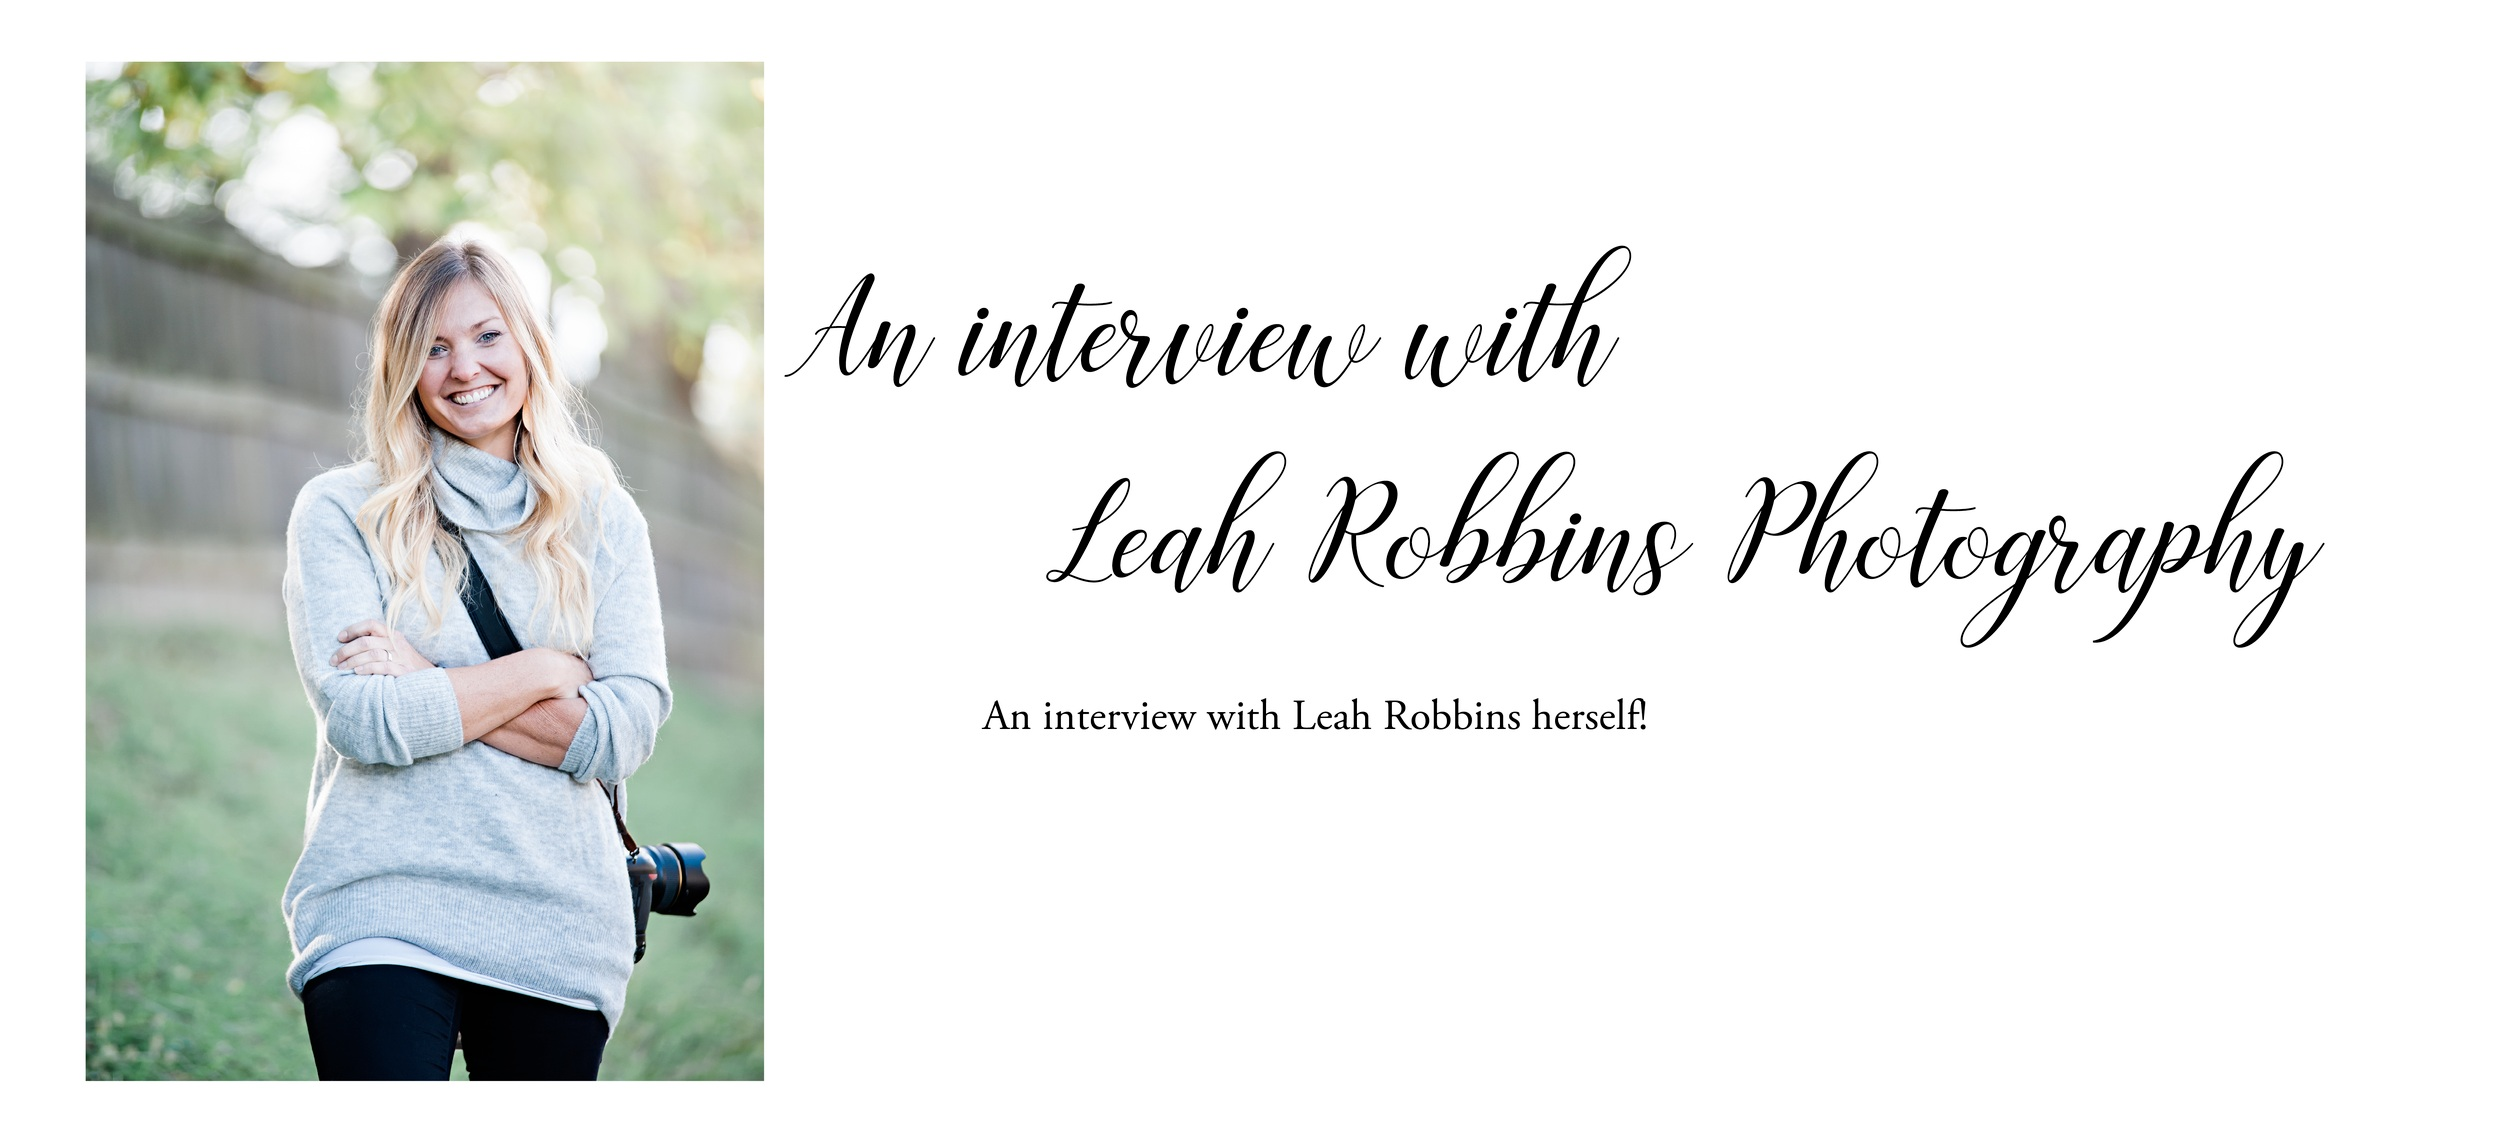 LeahRobbins.png